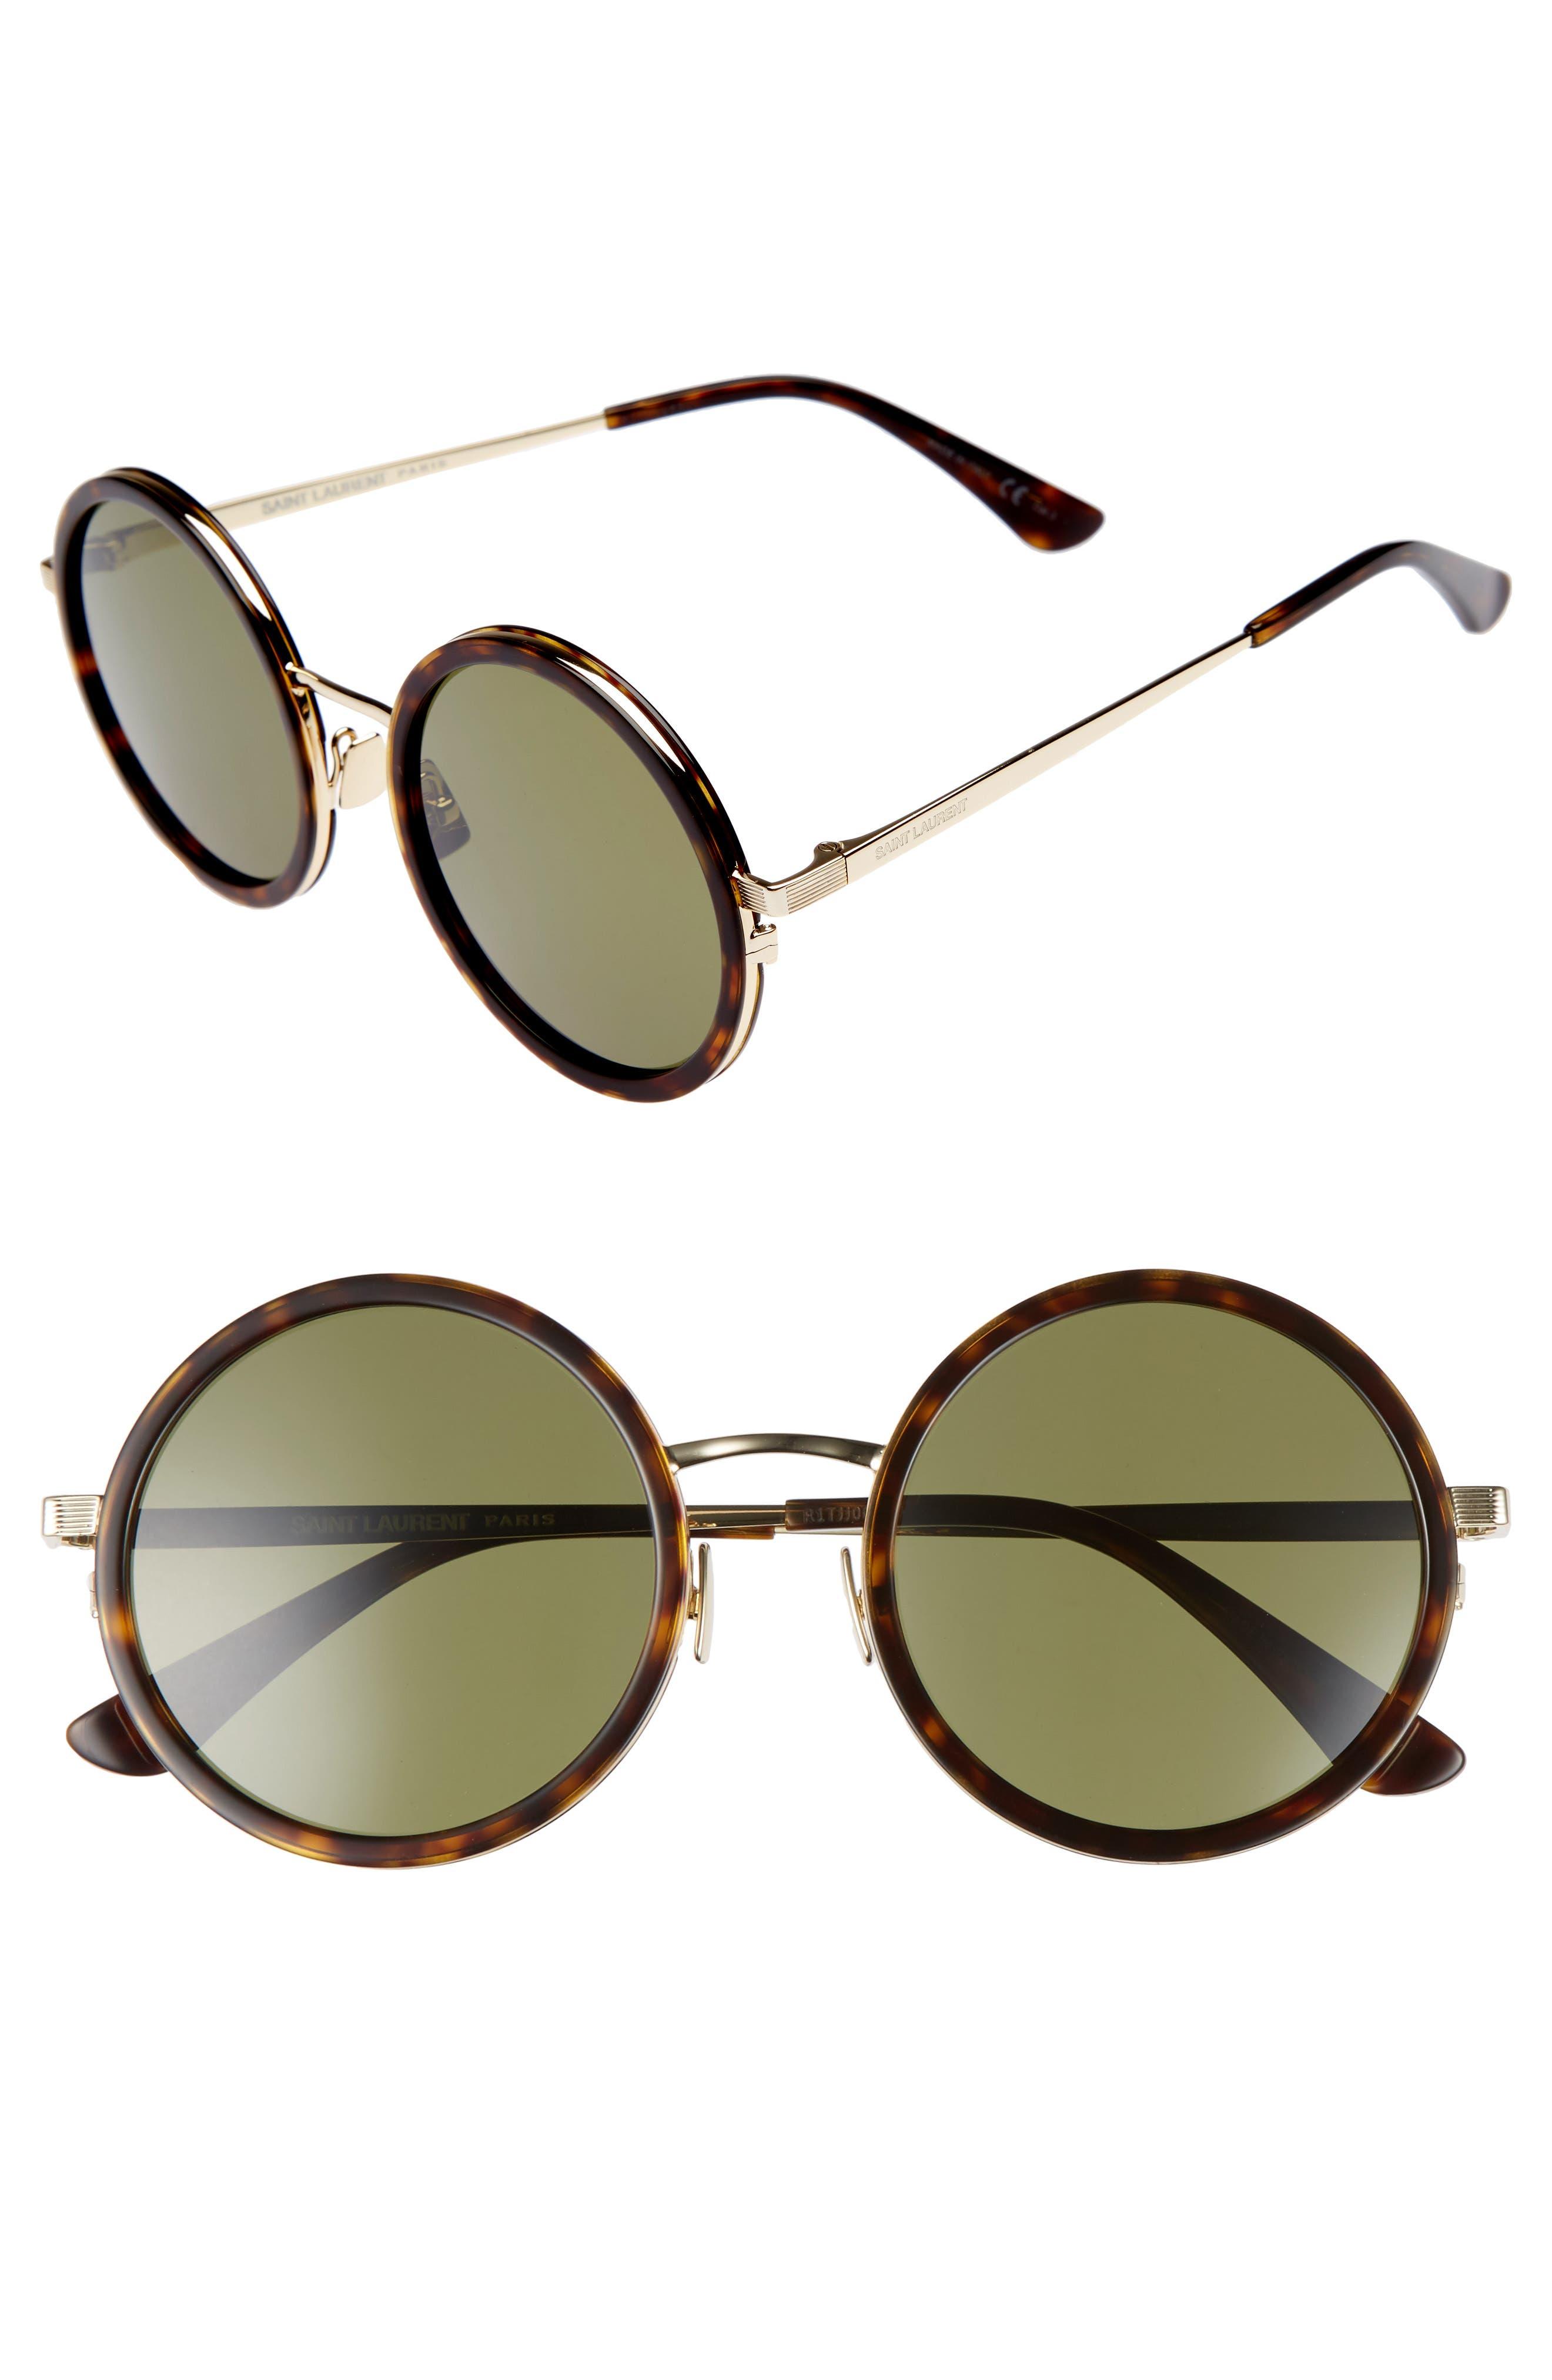 Main Image - Saint Laurent 52mm Round Sunglasses